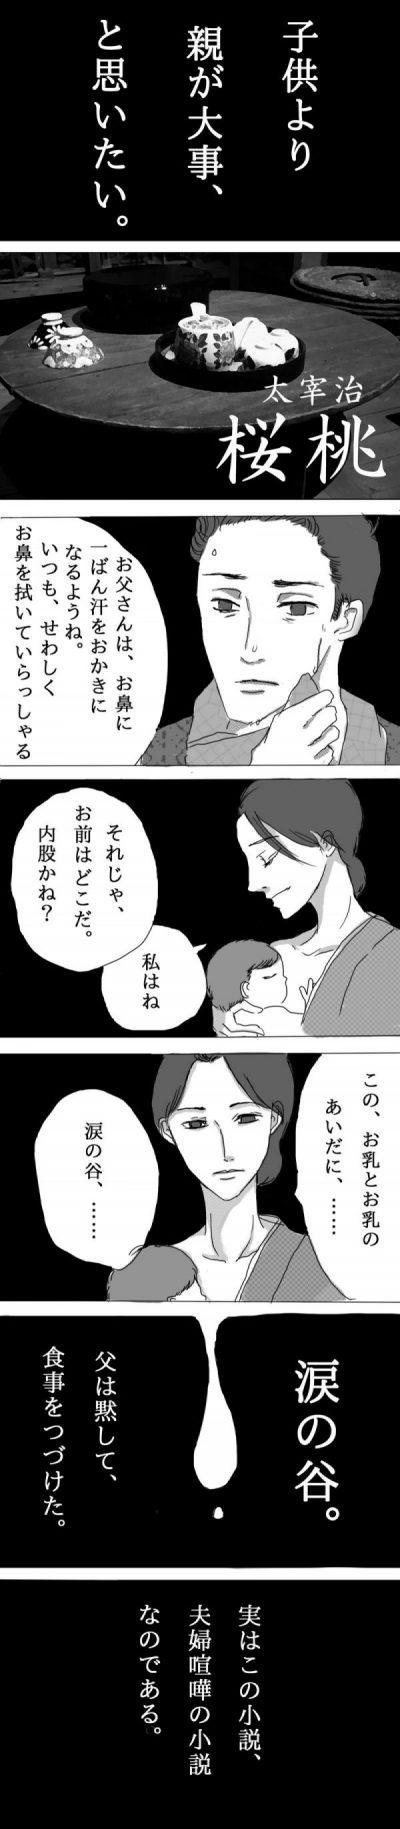 太宰 治 桜桃 解説